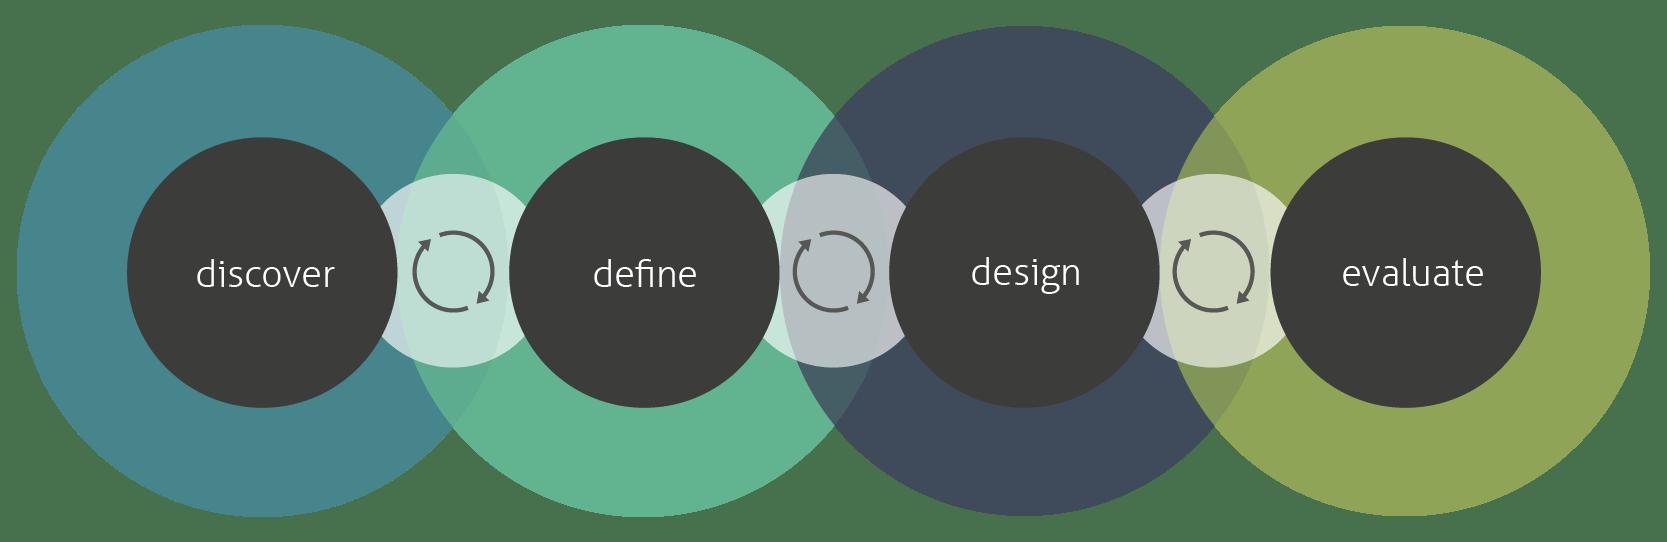 Iterativer User Experience Design Prozess nach Design Thinking Philosophie